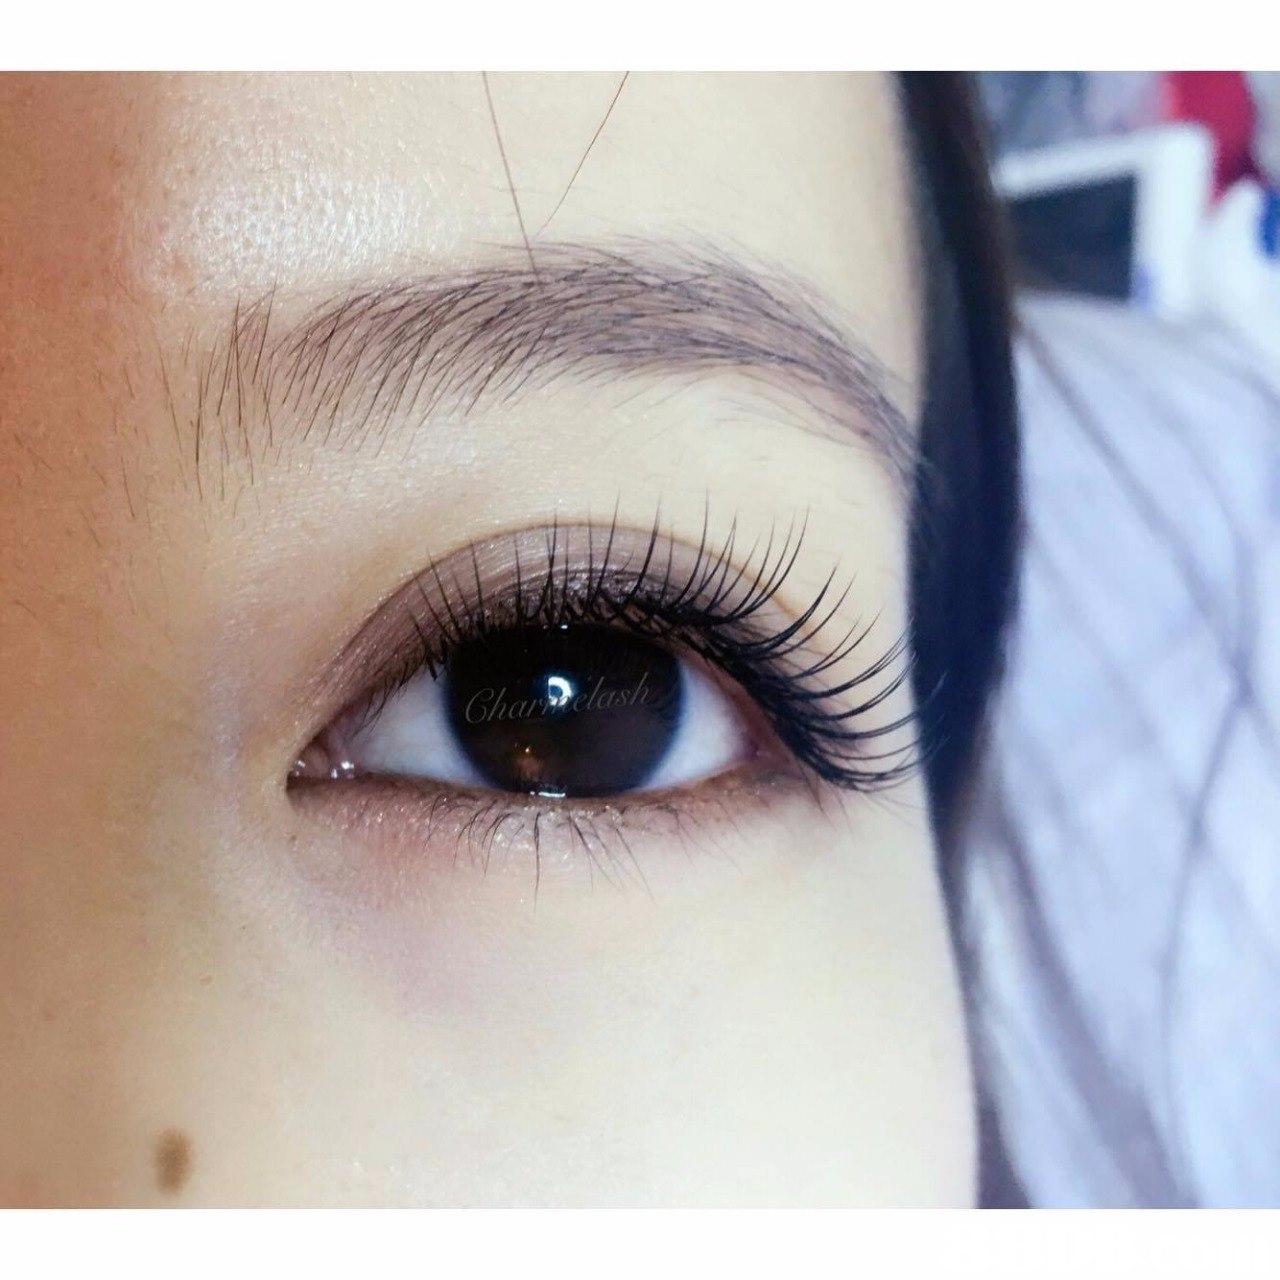 eyebrow,eyelash,eye,close up,forehead